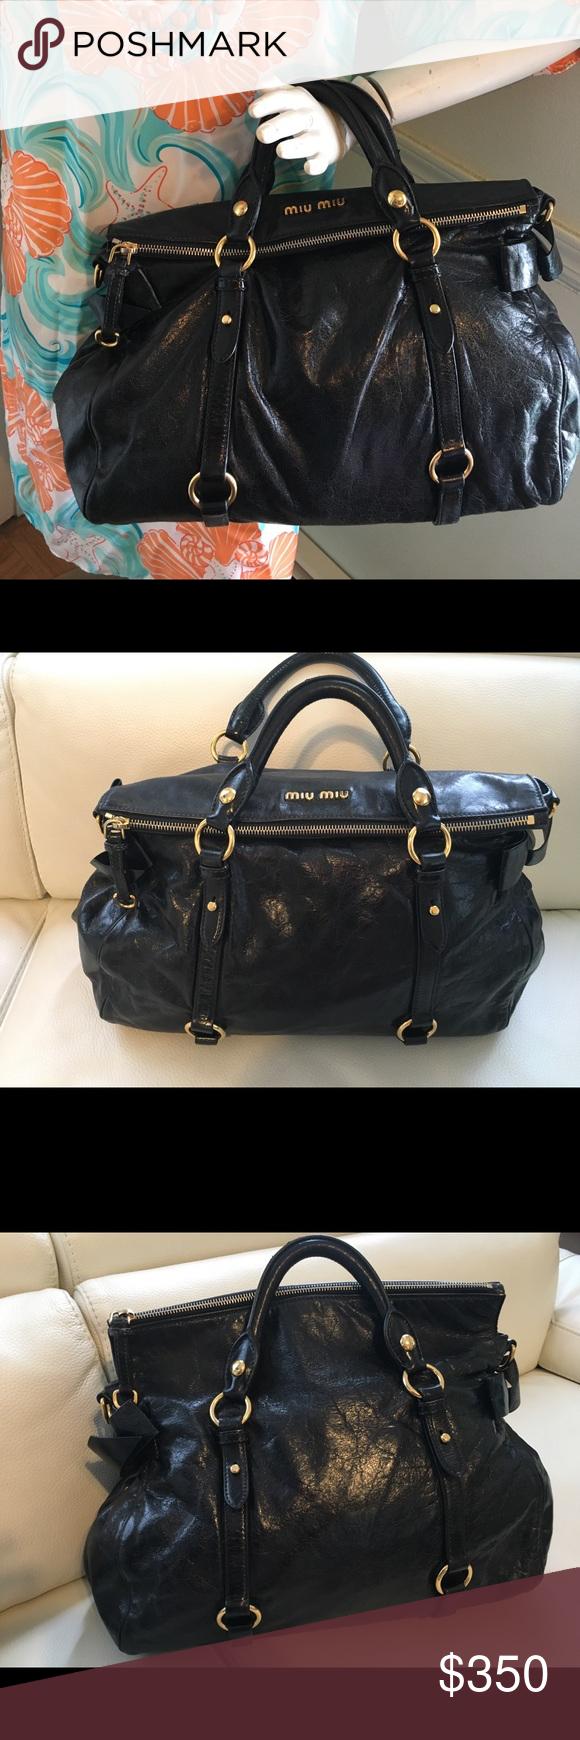 68197e3fb93e MIU MIU Vitello Lux Large Bow Bag Nero Black authentic MIU MIU Vitello Lux  Large Bow